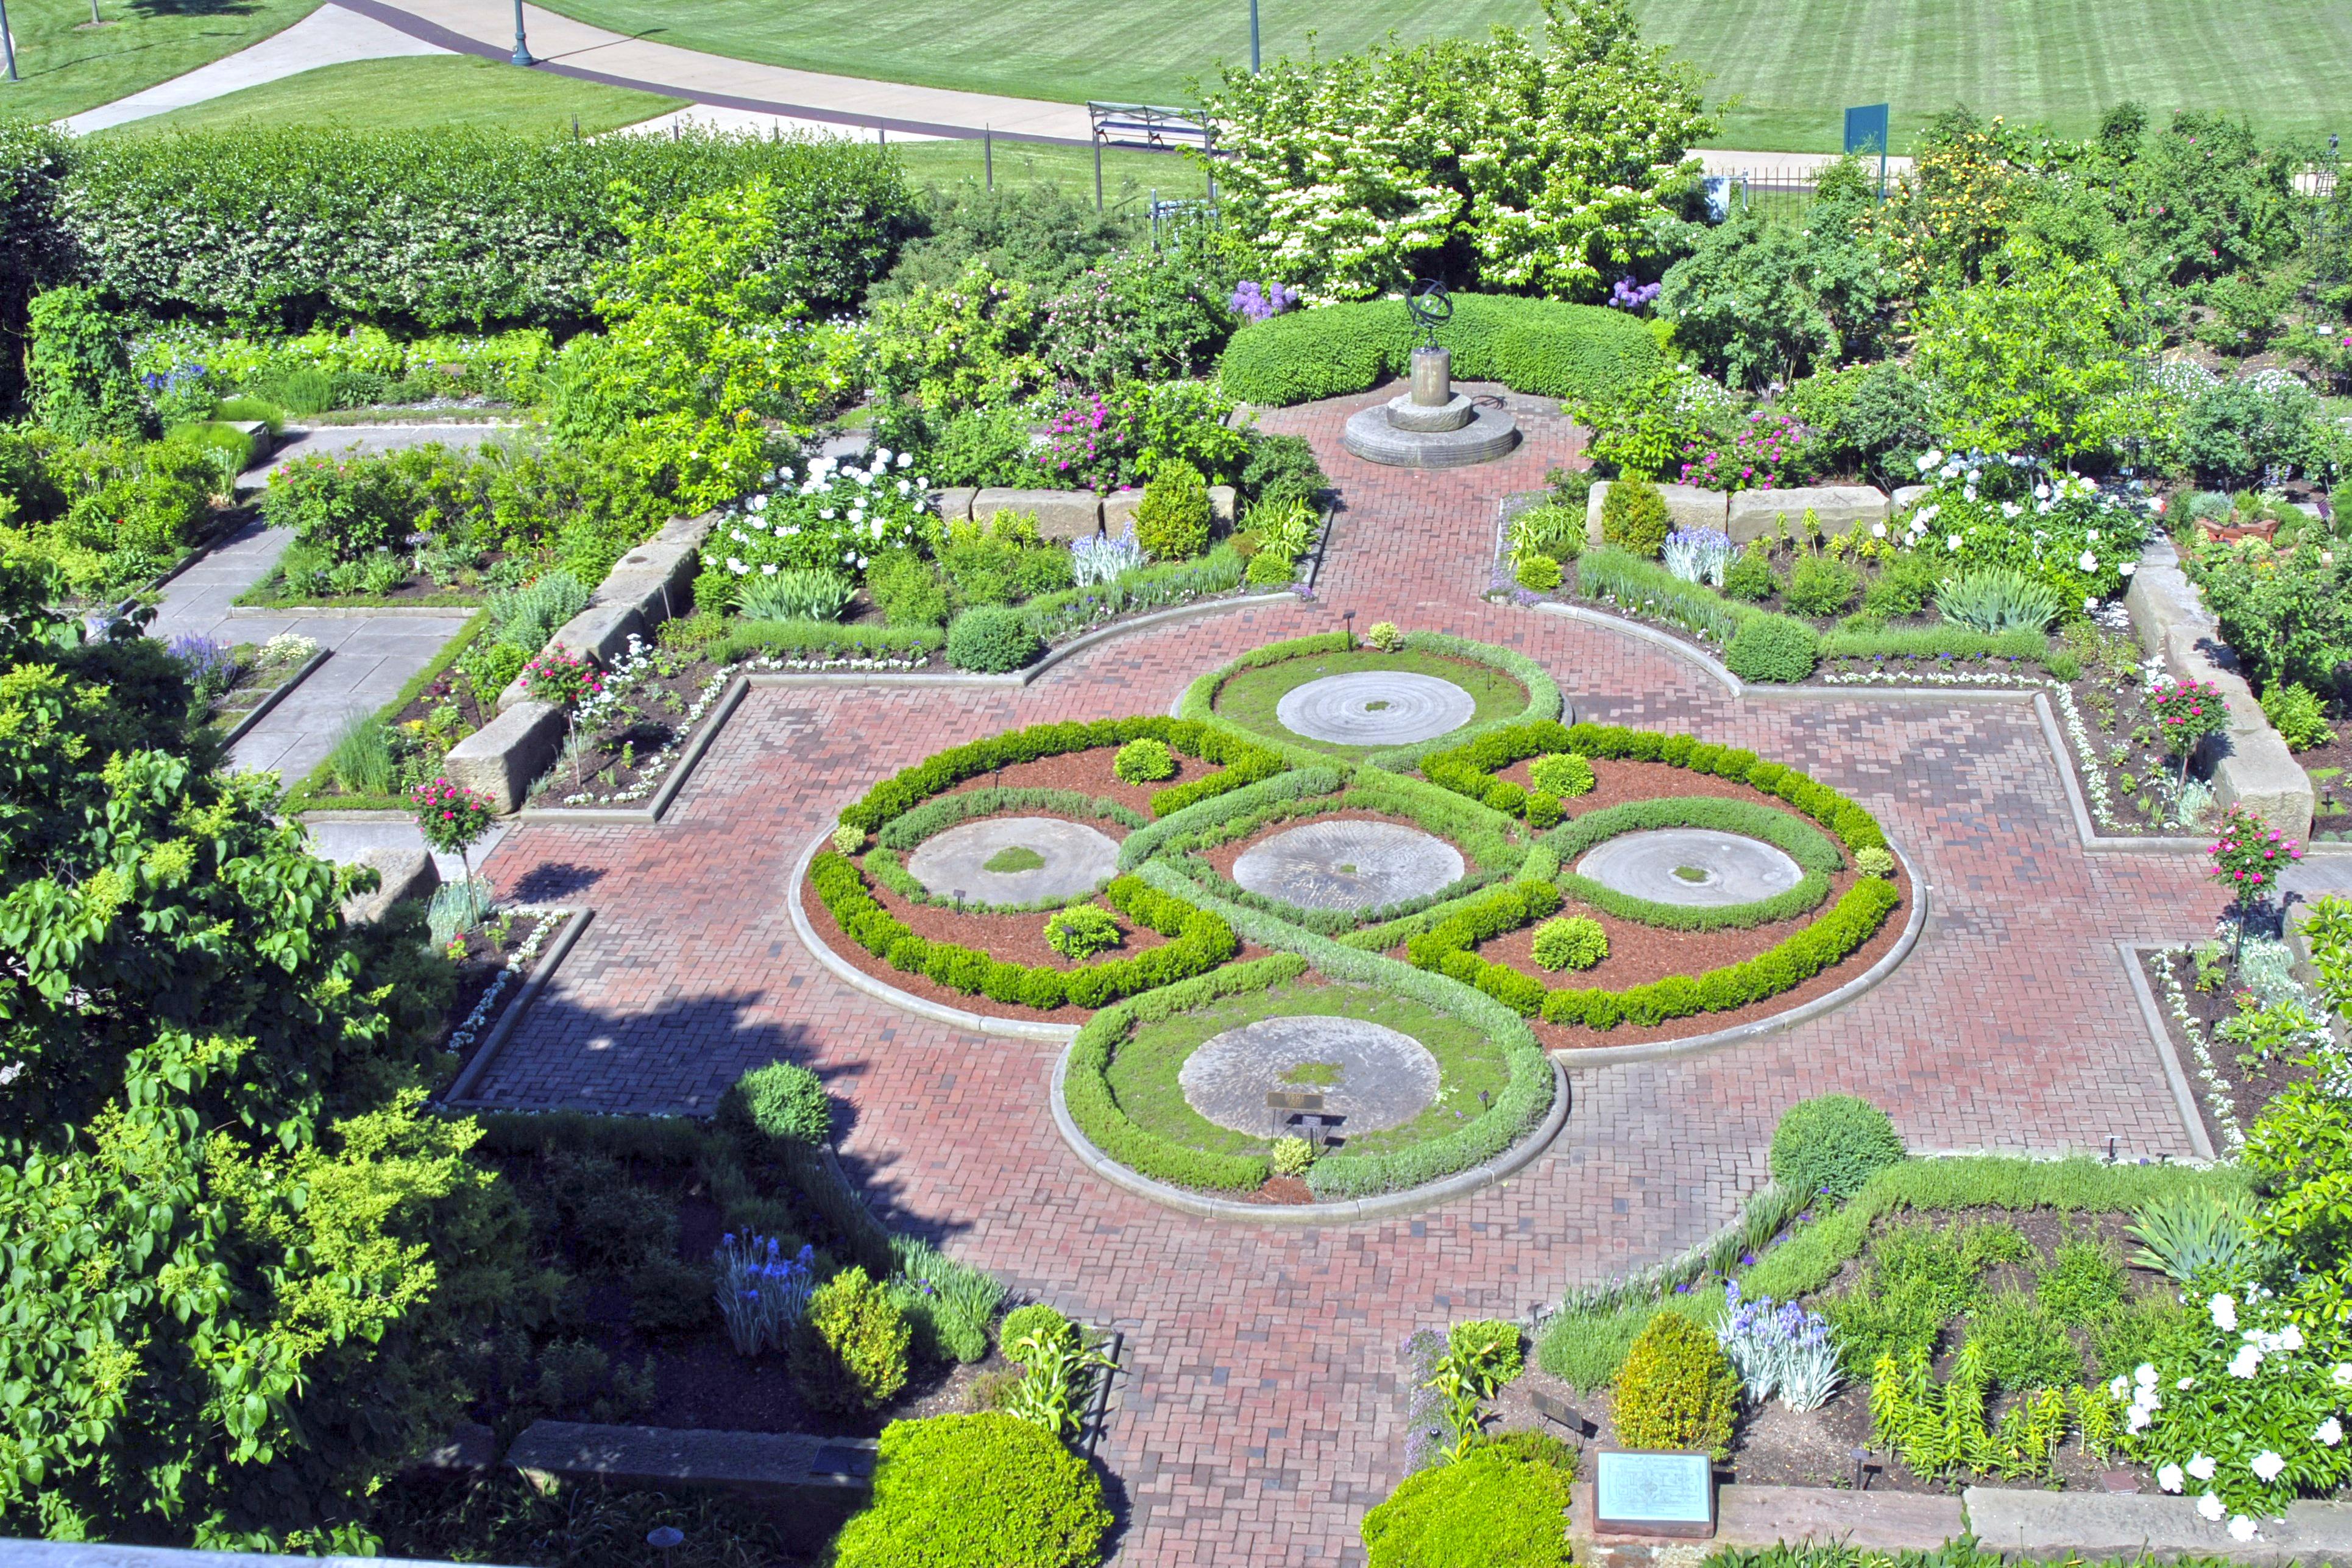 Knot and Fragrance Garden - Summer